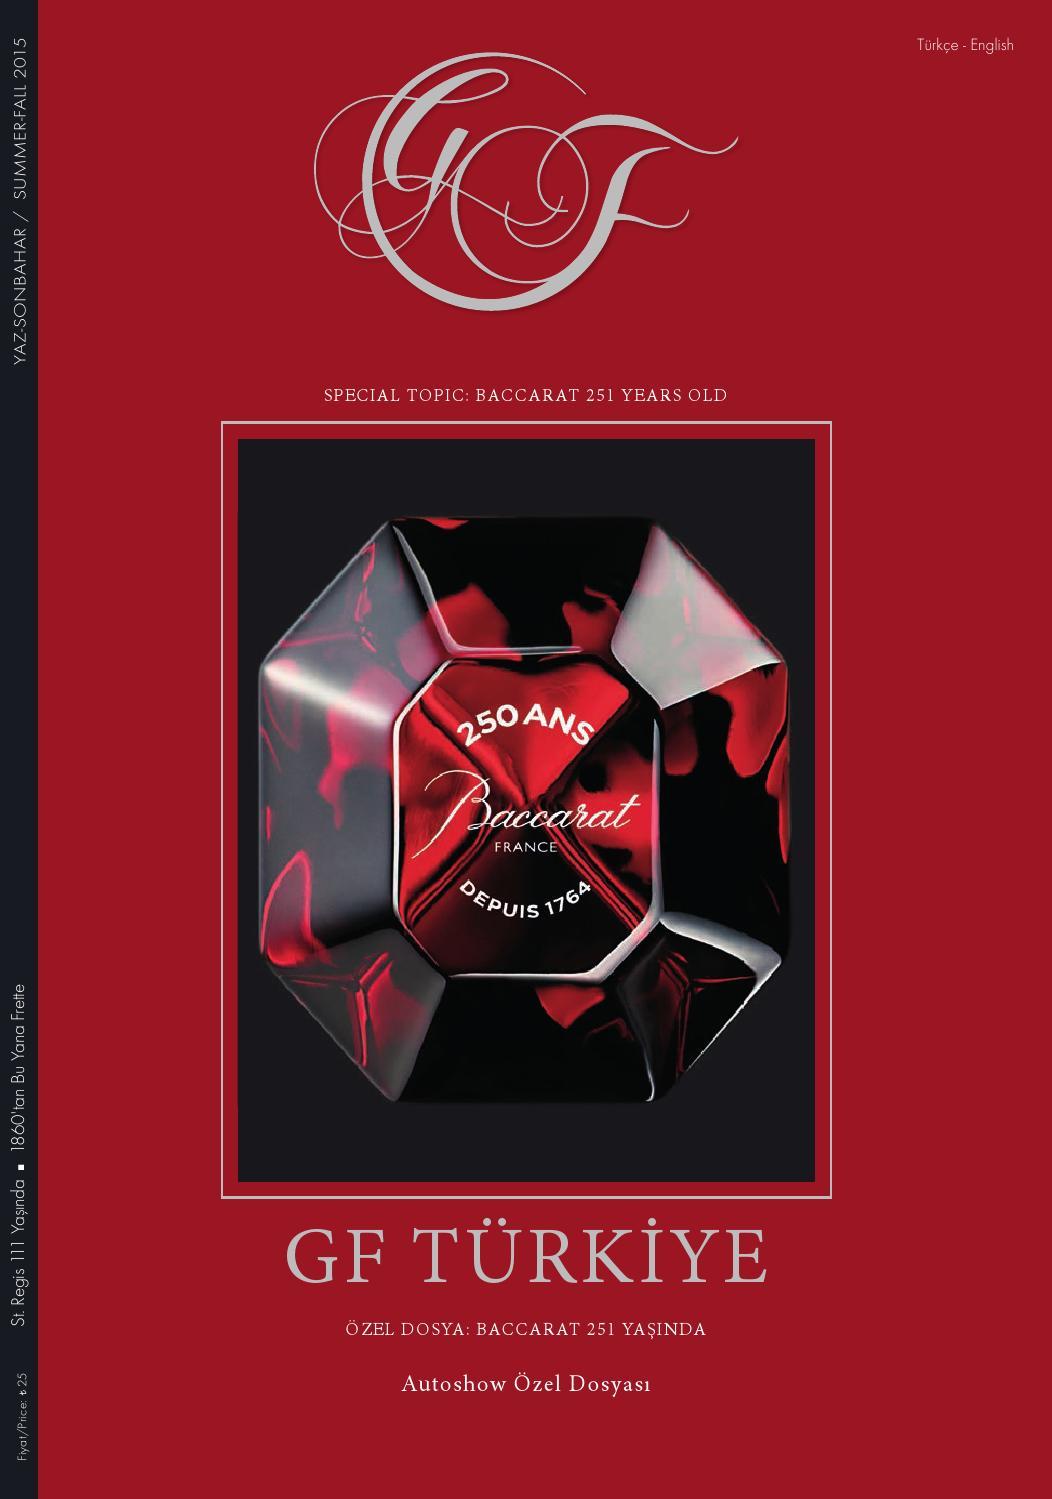 Gf Edition Turkiye For Connaisseurs Summerfall 2015 By Gf ... intérieur Salon De Jardin En Promotion